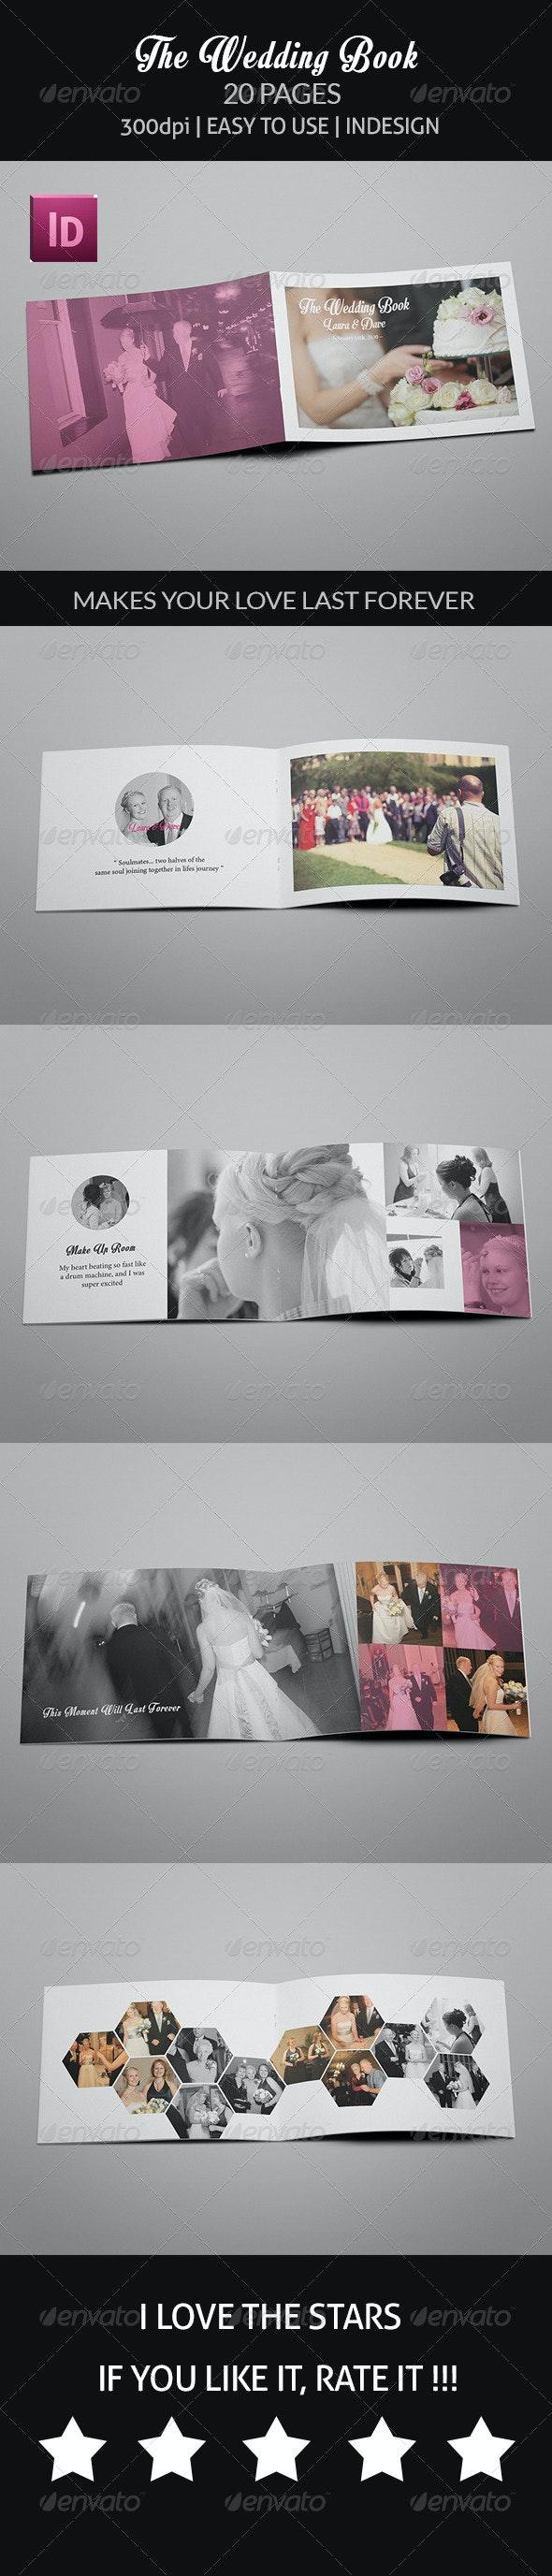 The Wedding Book - Print Templates